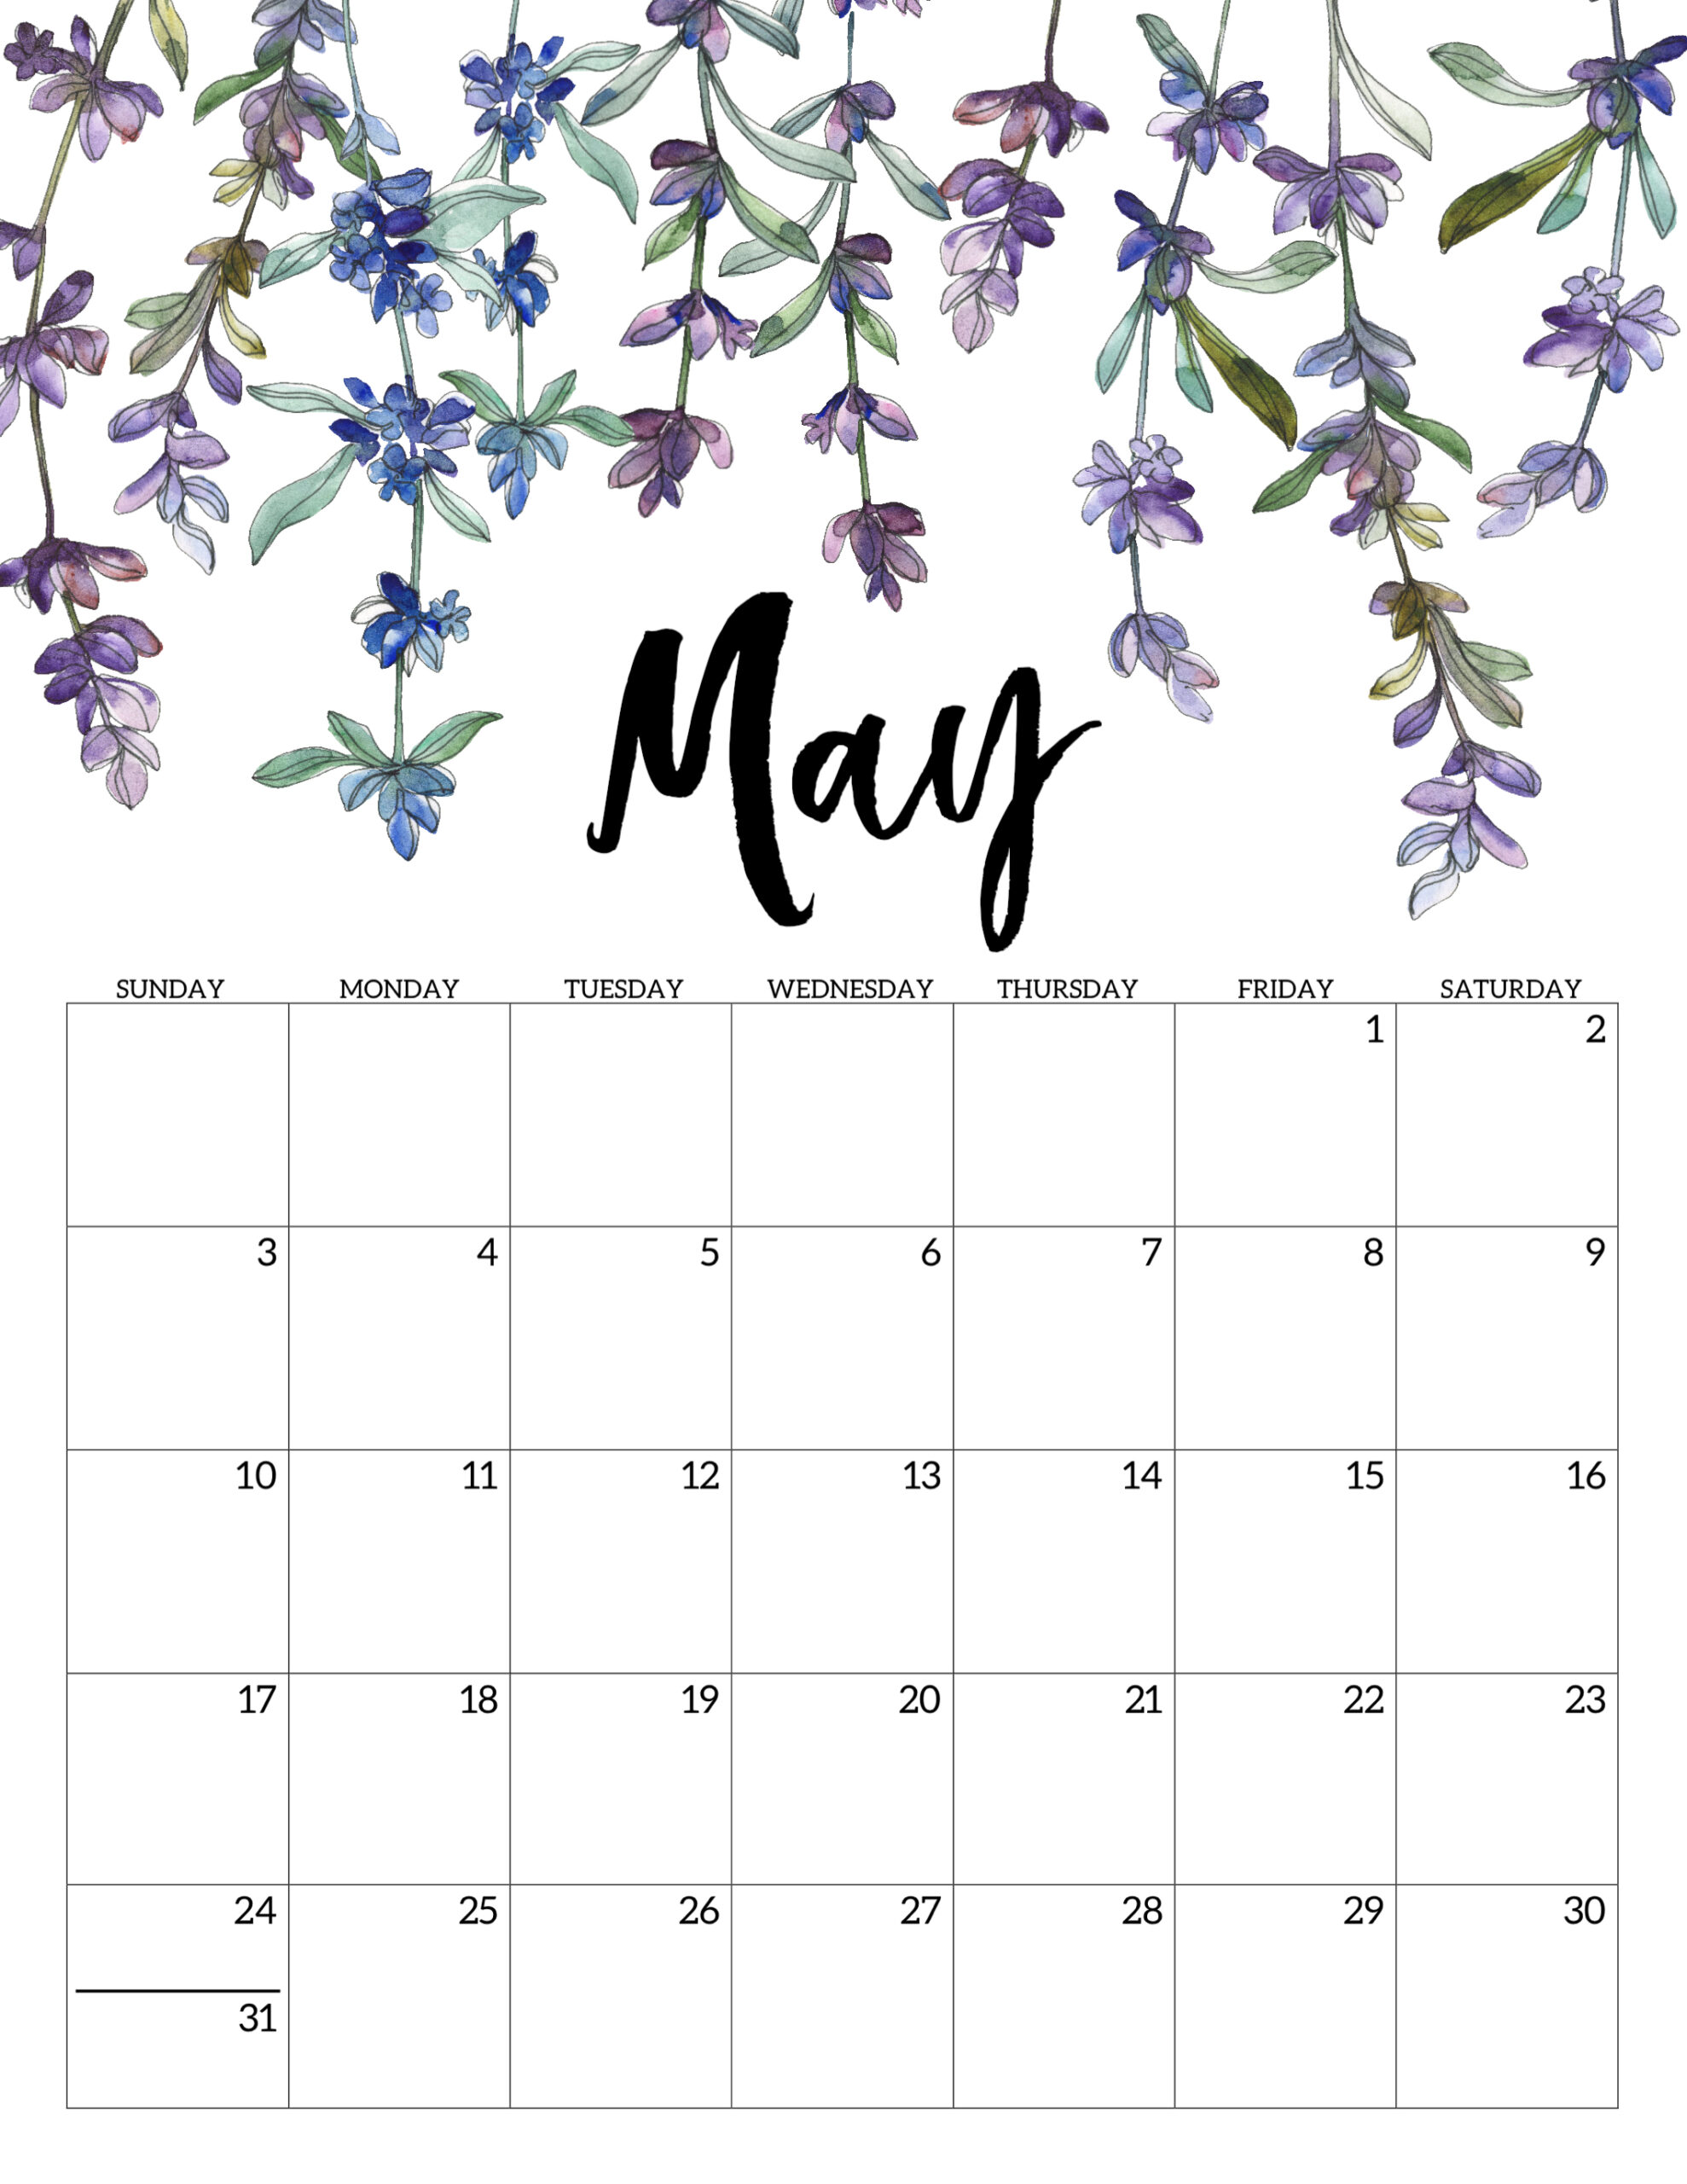 2020 Free Printable Calendar - Floral | Paper Trail Design